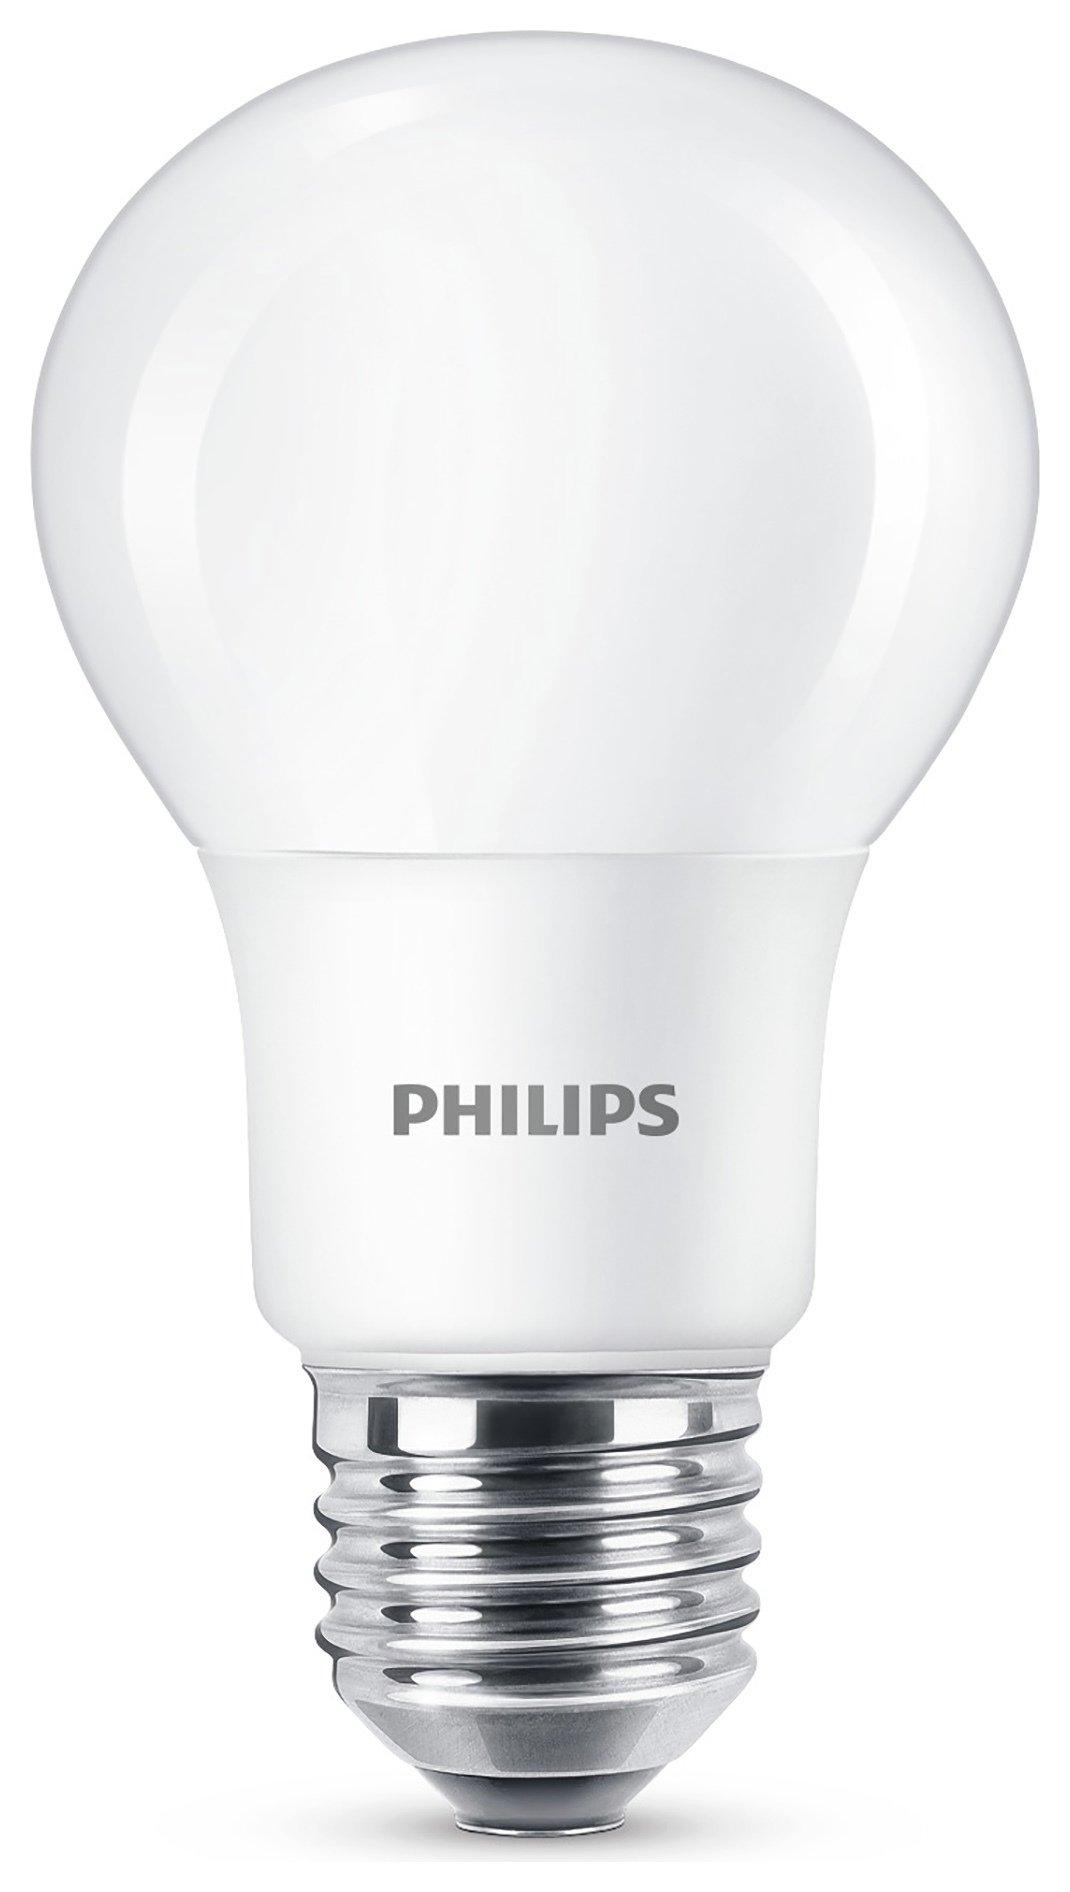 8718696586099 EAN - Philips Led Lampe, Ersetzt 100 W, E27, Warmweiß ...